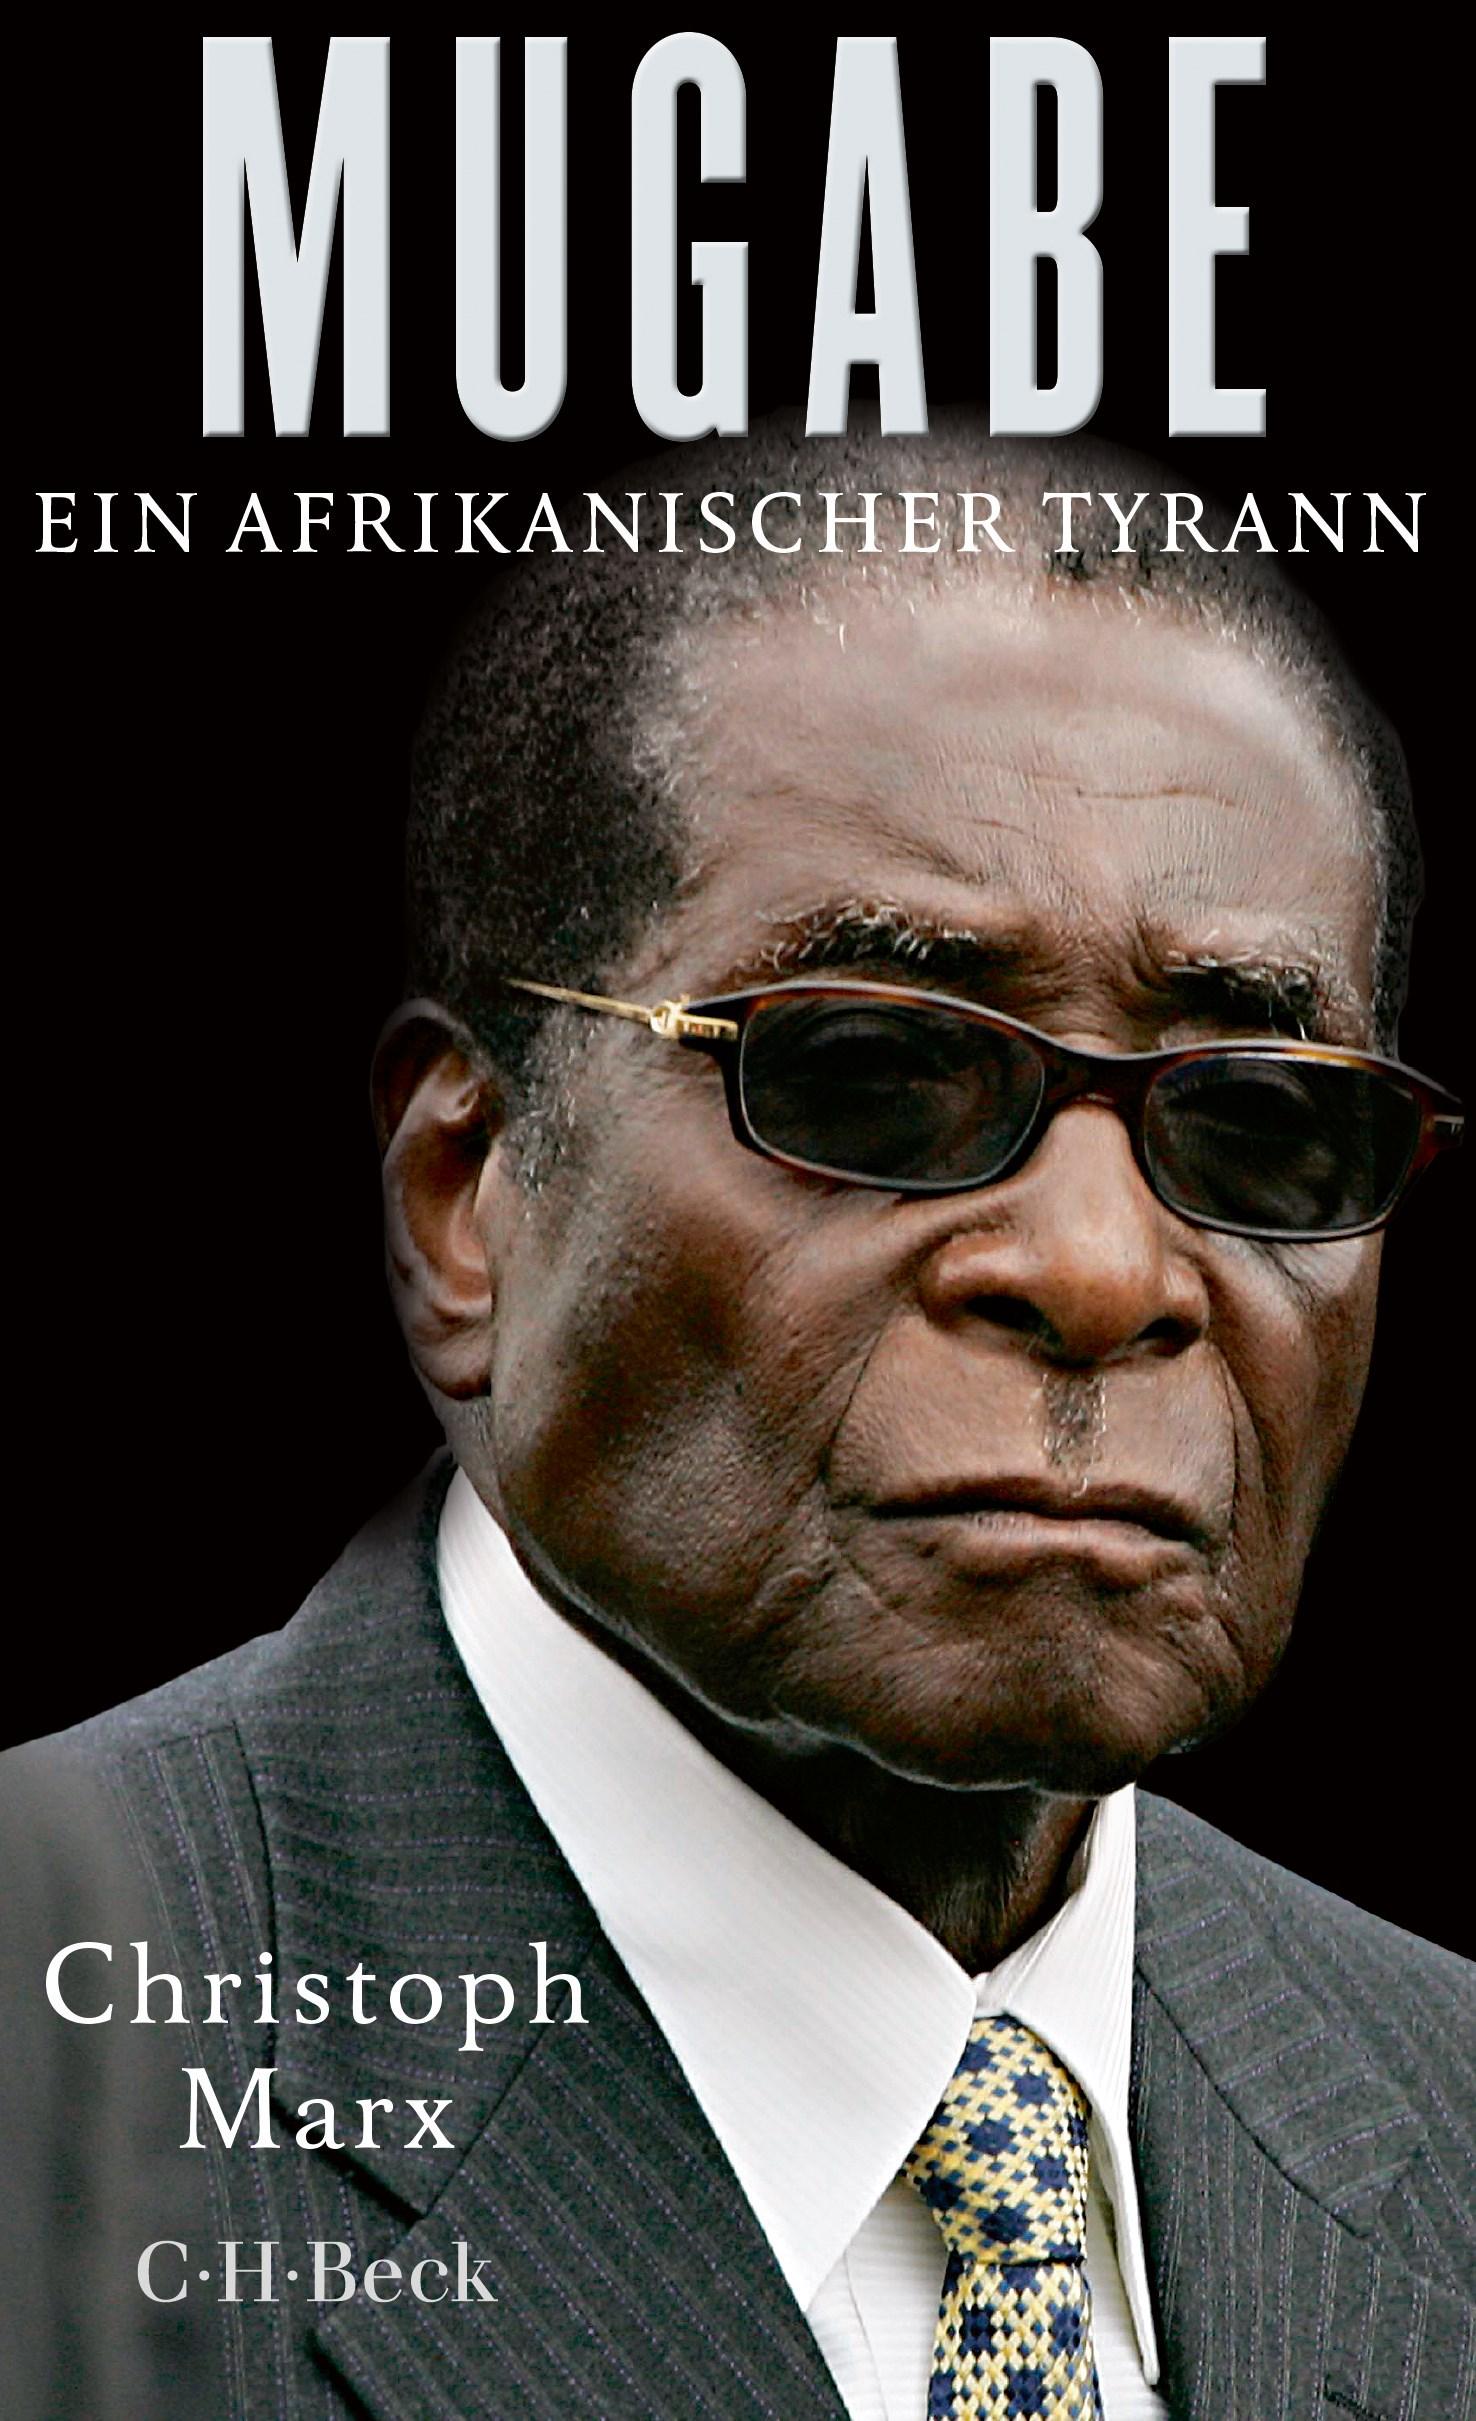 Christoph Marx, Mugabe